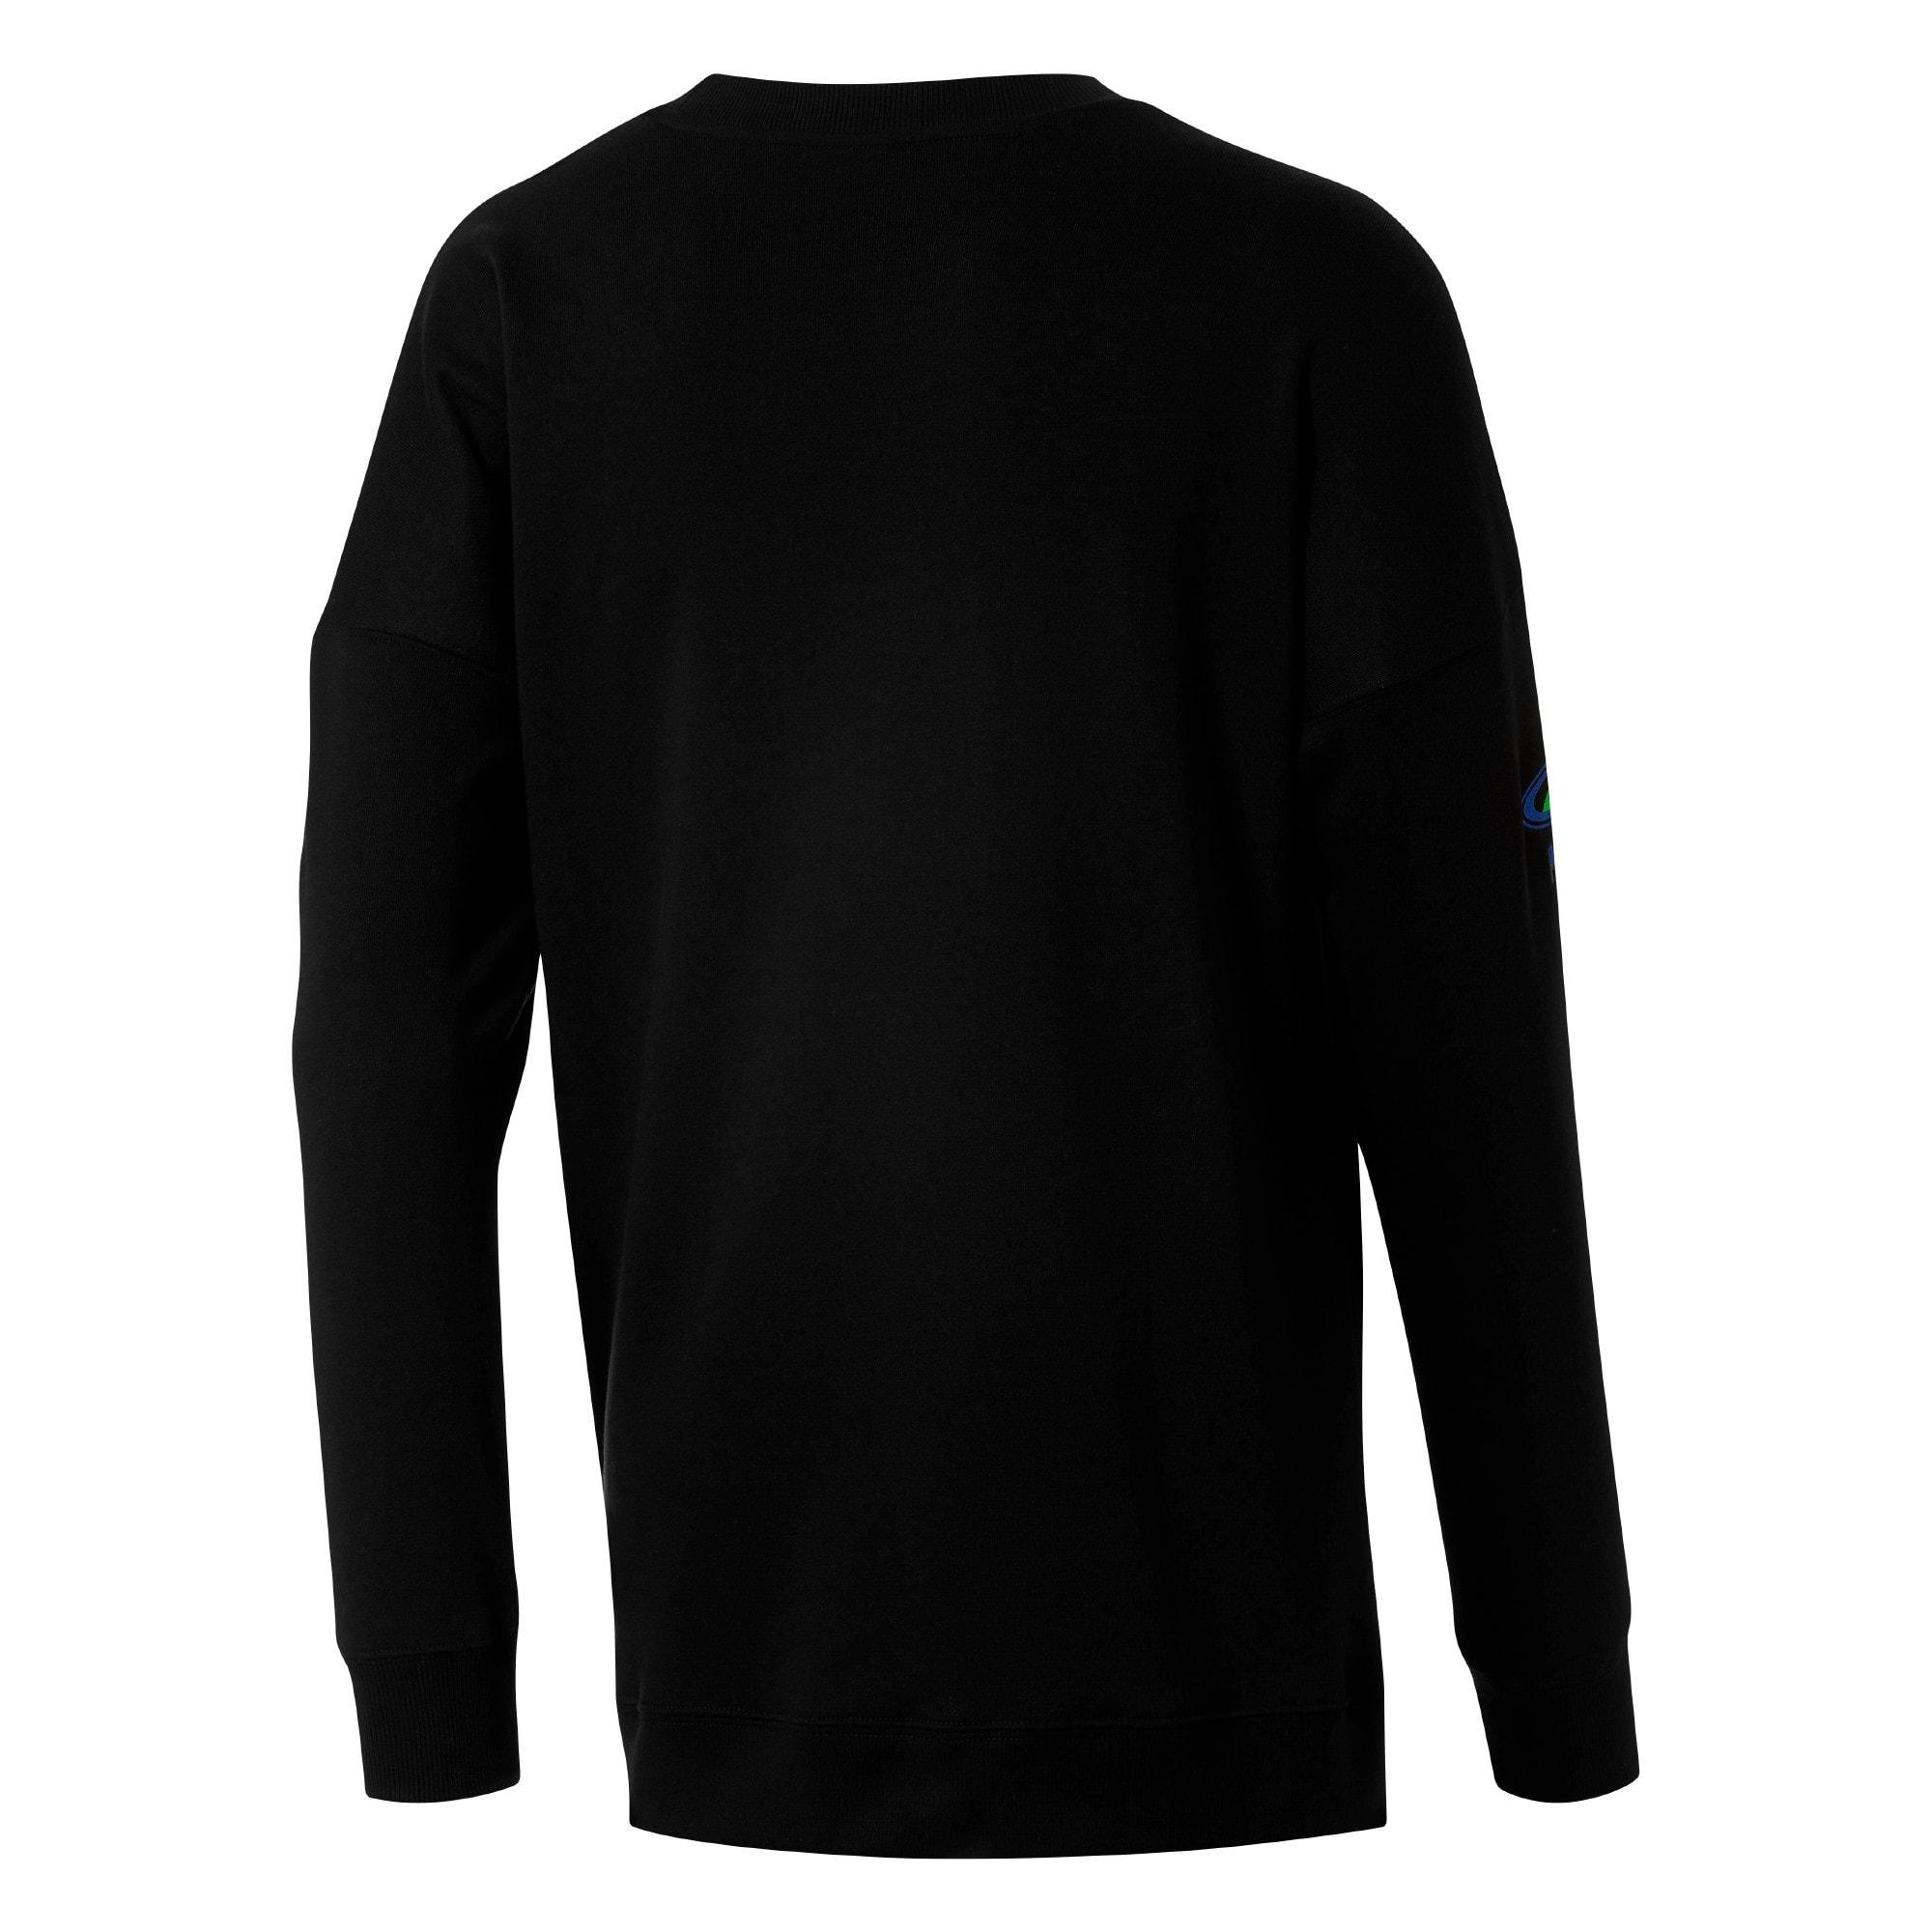 Thumbnail 3 of OG Men's Crewneck Sweatshirt, Puma Black, medium